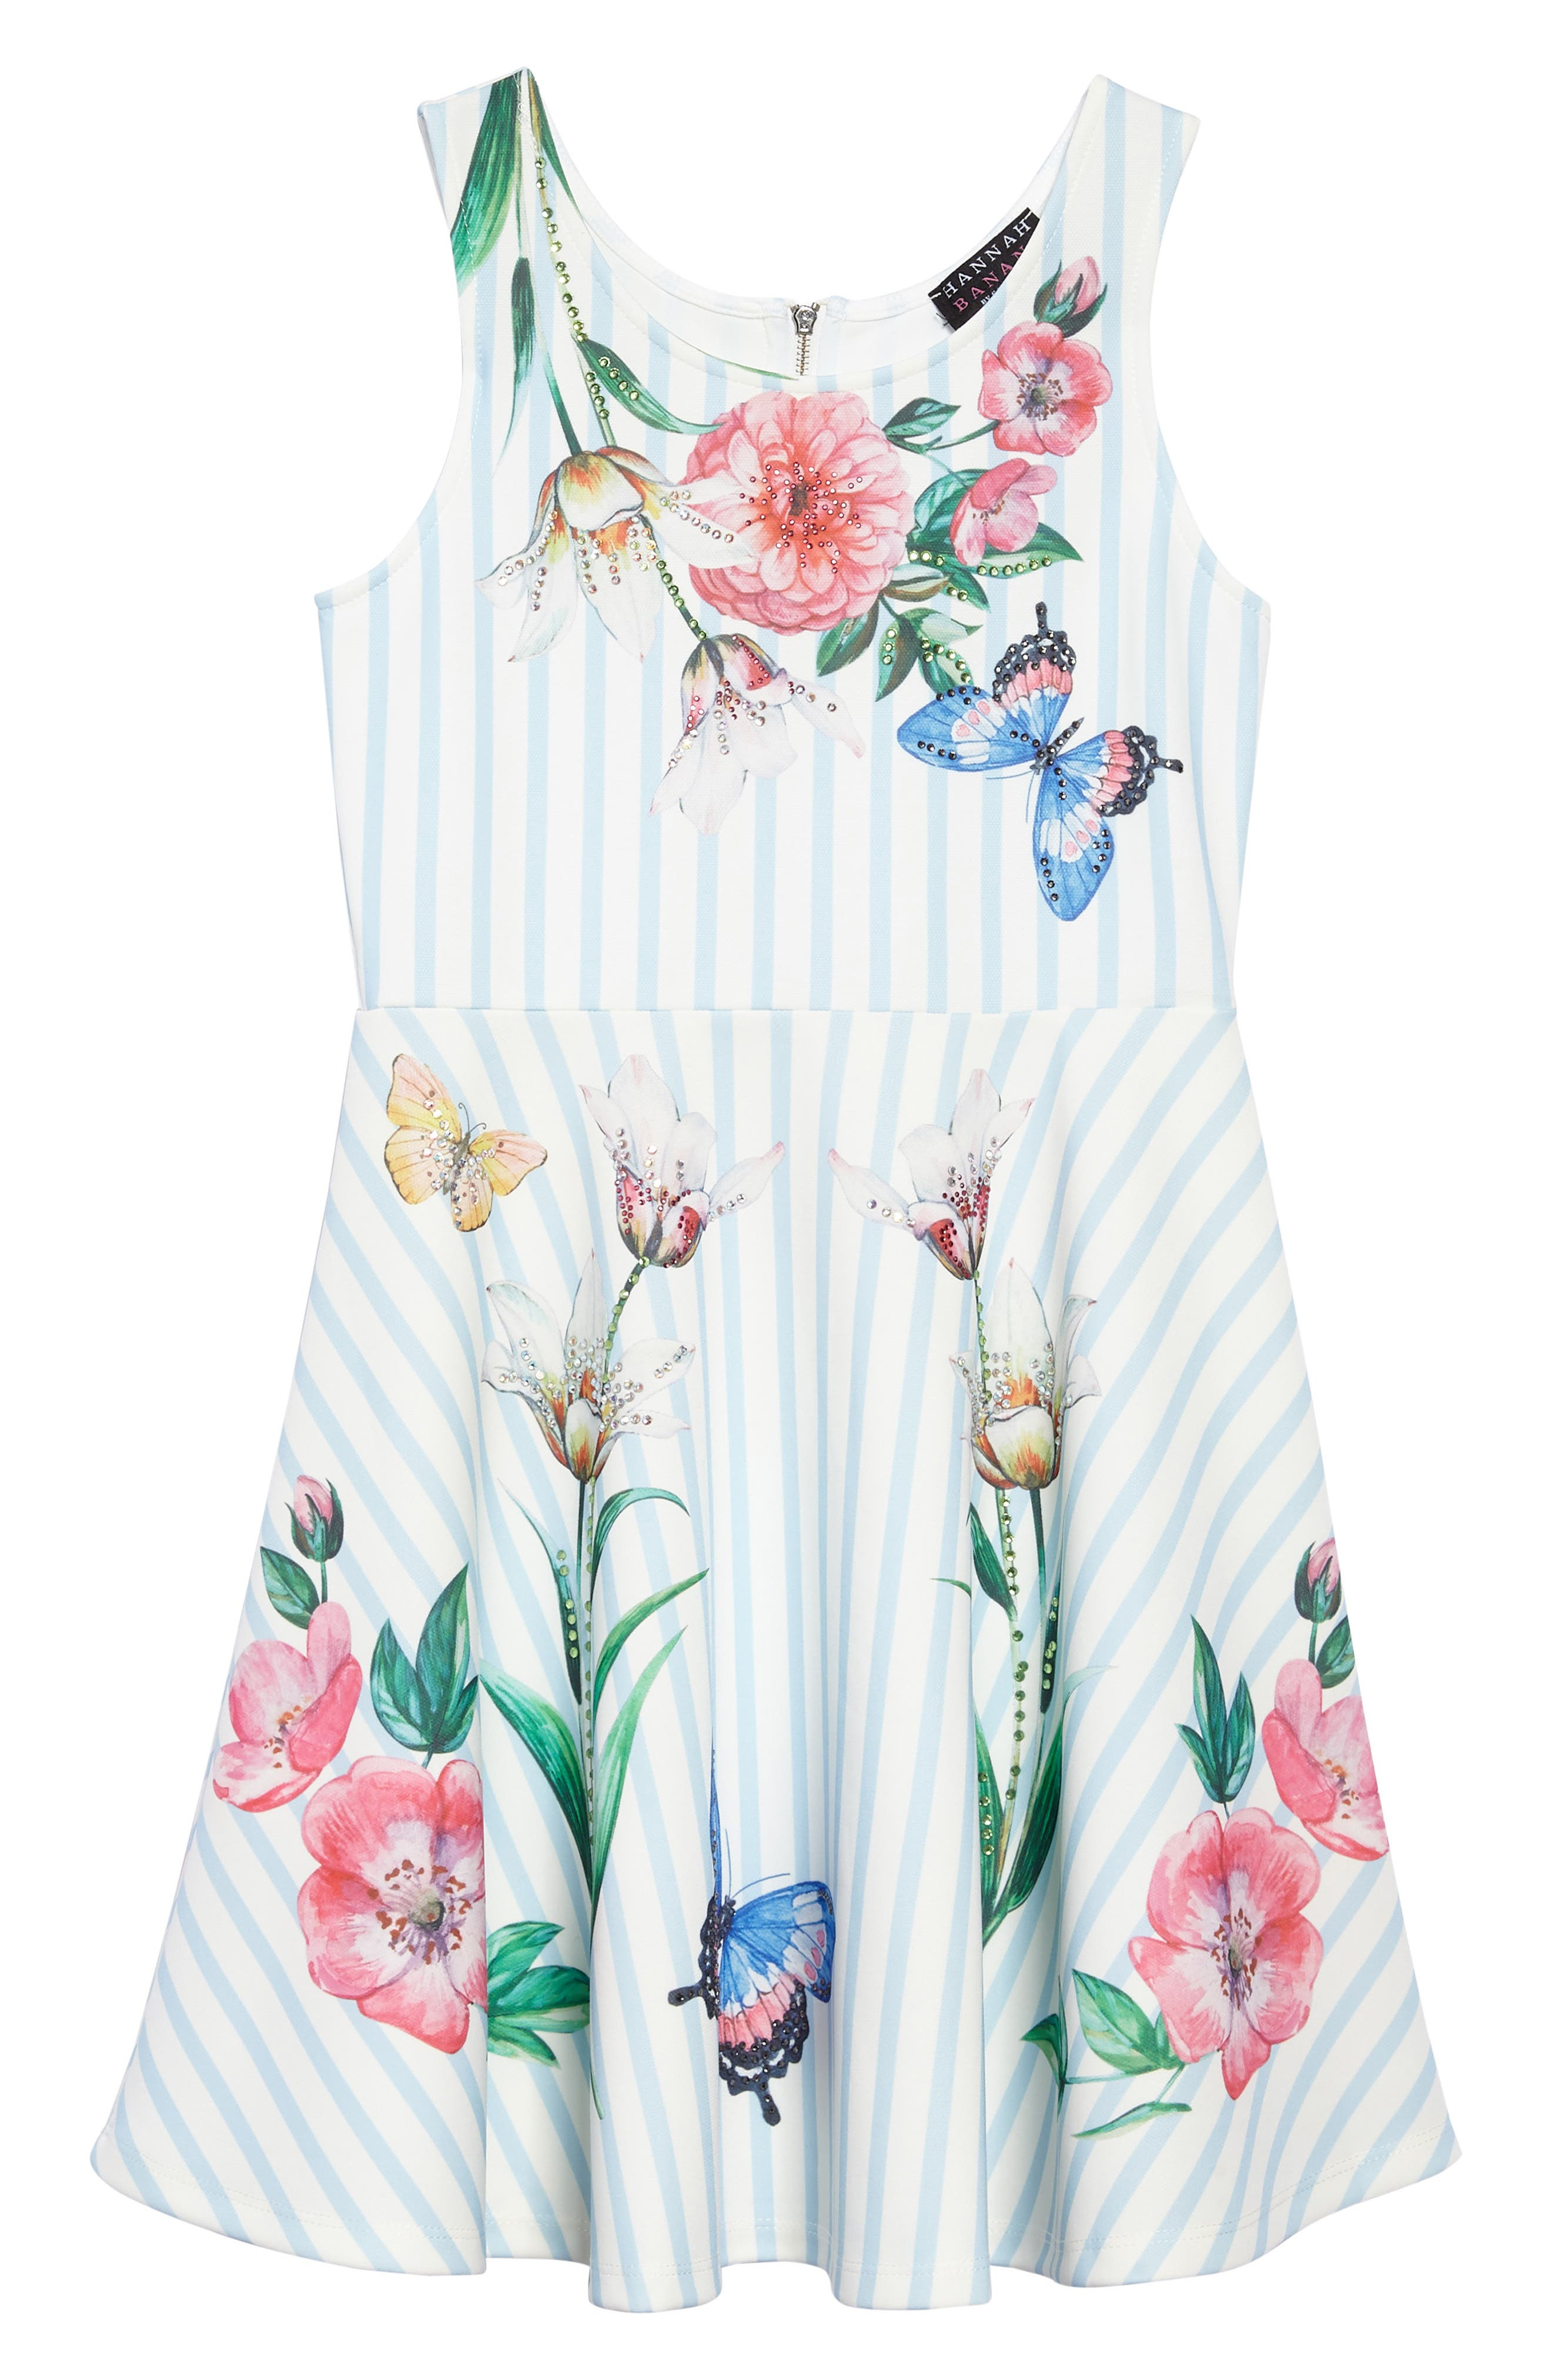 Stripe Floral Skater Dress,                         Main,                         color, Blue/ White